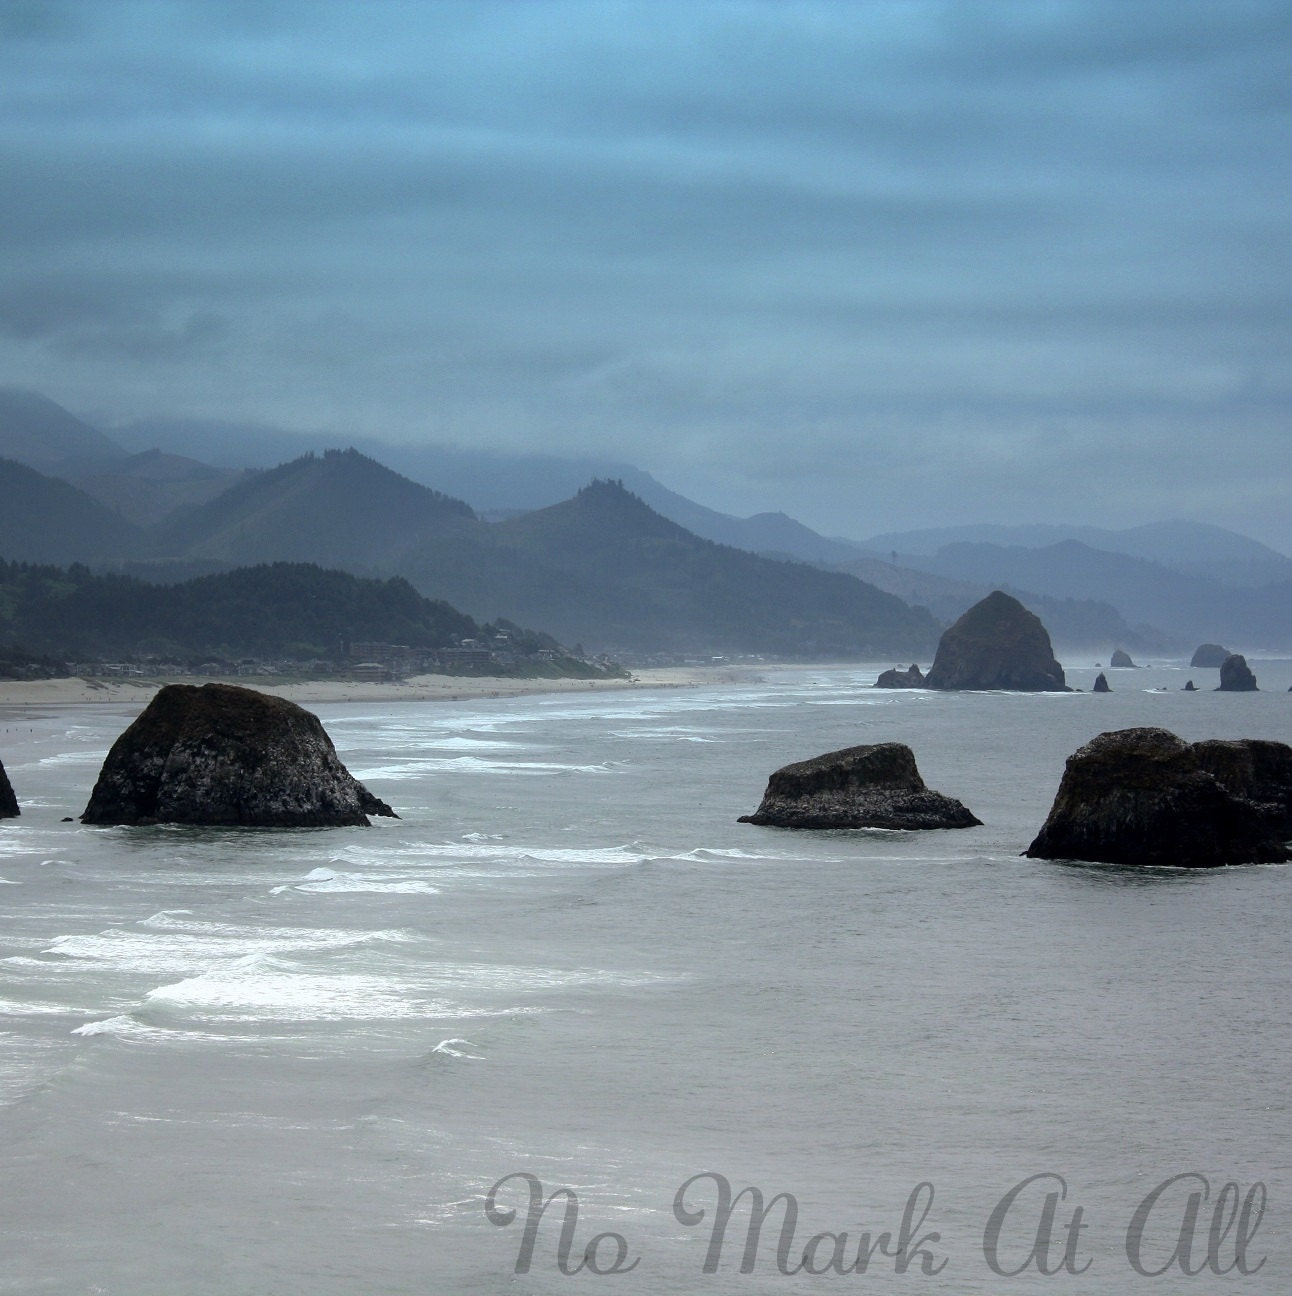 Oregon Coast Photo, Cannon Beach, Blue, Ocean, Shades, Mountains, White - 6x6 Print - NoMarkAtAll